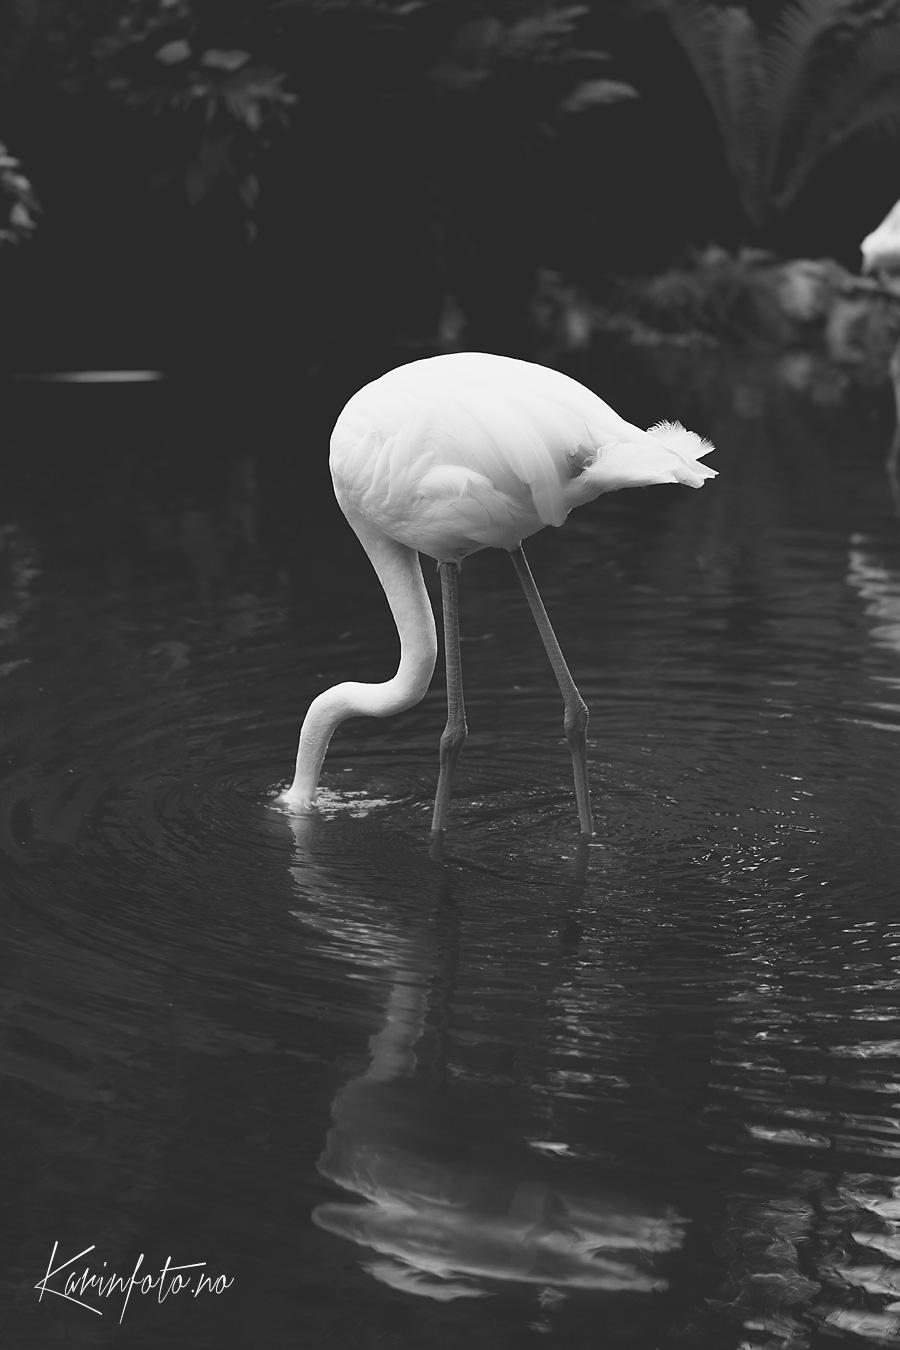 Flamingo,karinfoto,Fotograf,kristiansand,dyreparken,dyrepark,sorthvitt